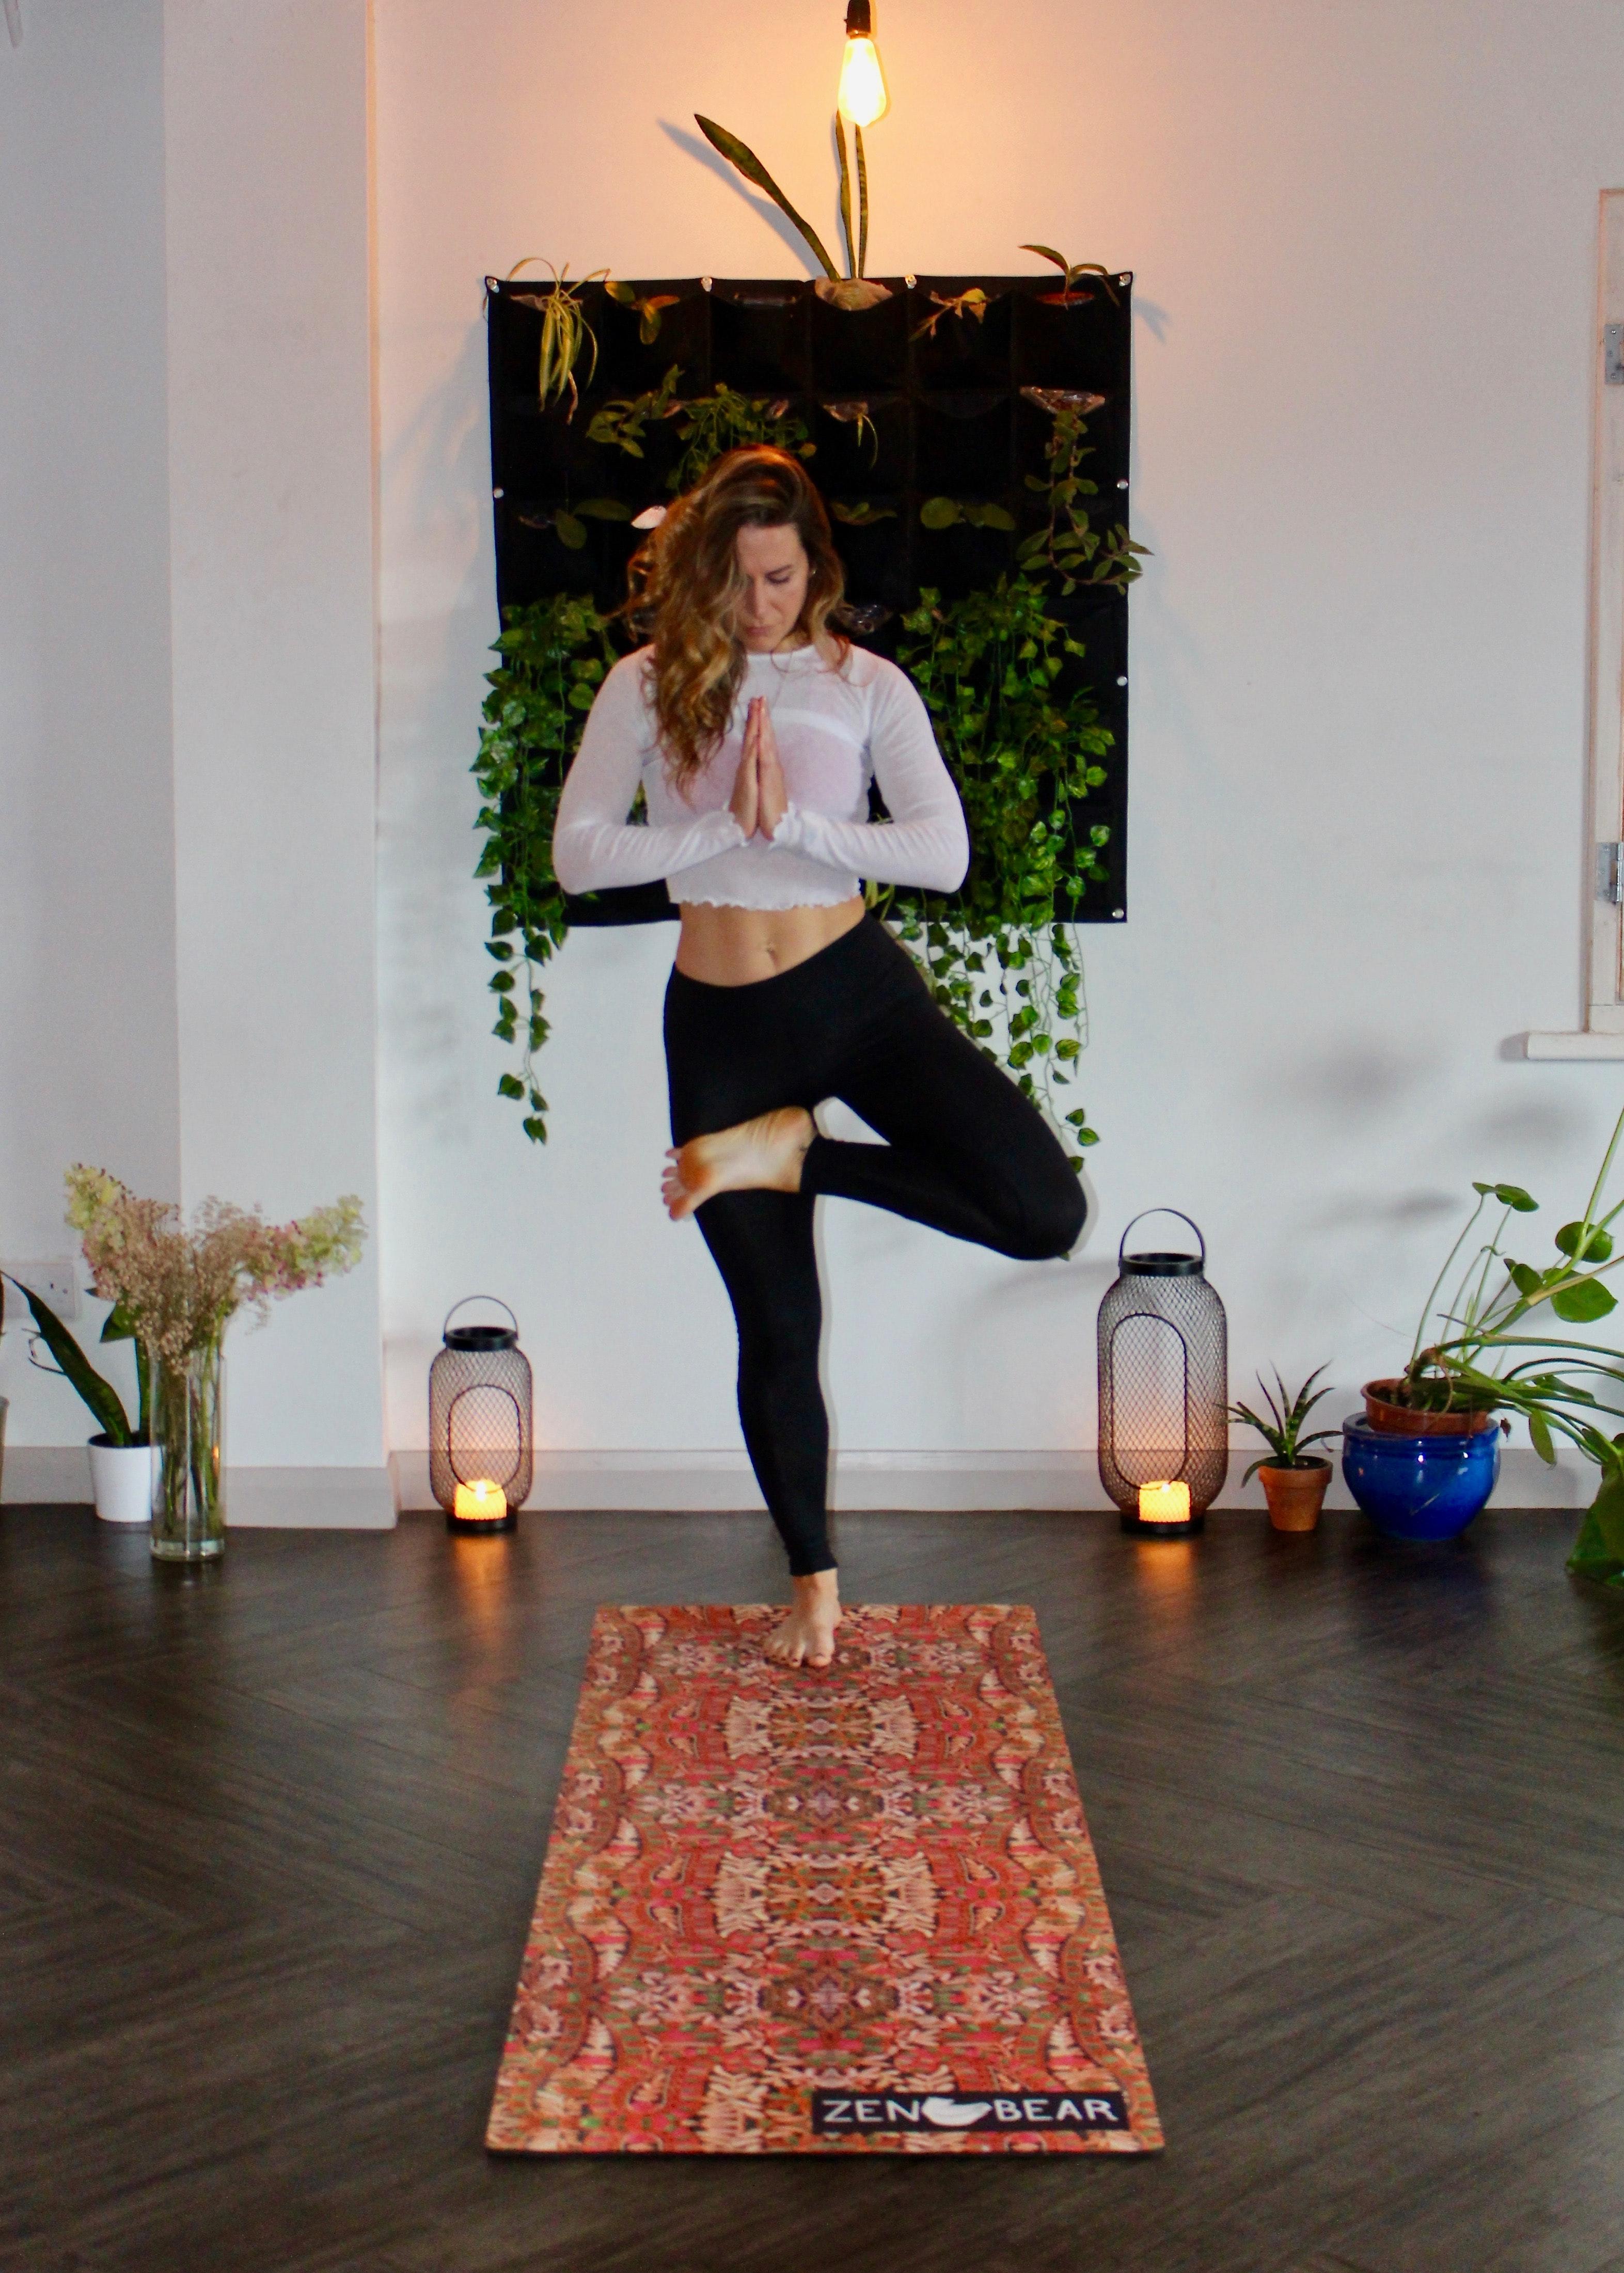 Photo by Zen Bear Yoga on Unsplash